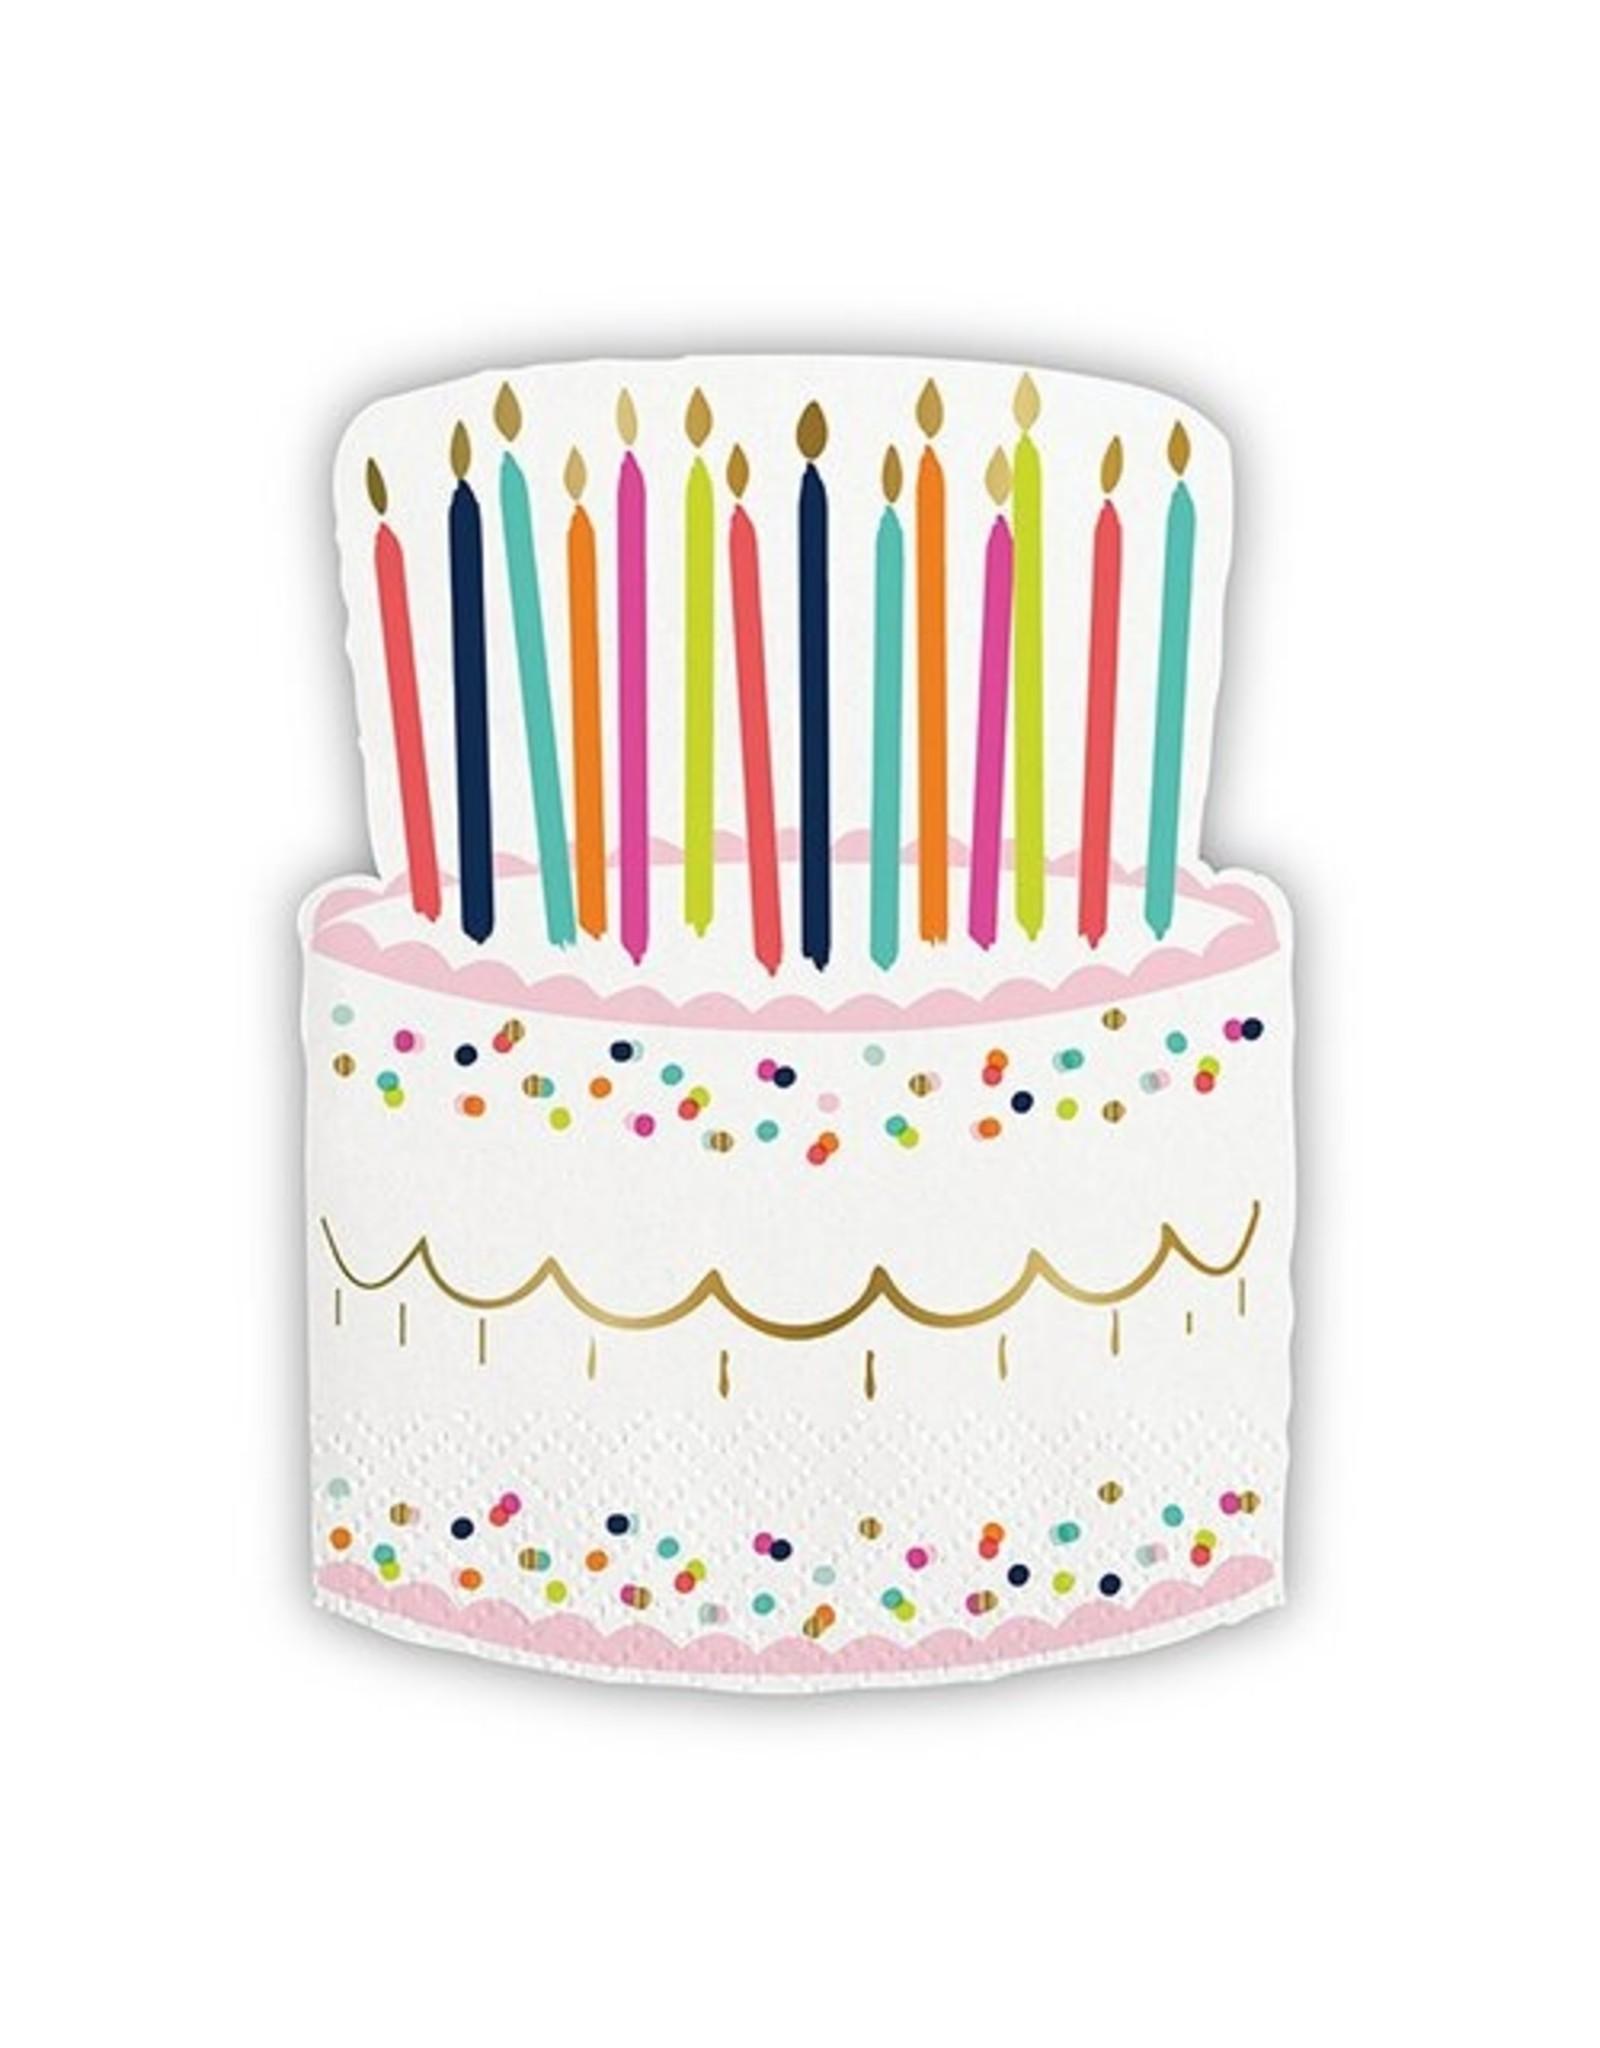 Beverage Napkins, Cake w/Candles Design, 20 ct.